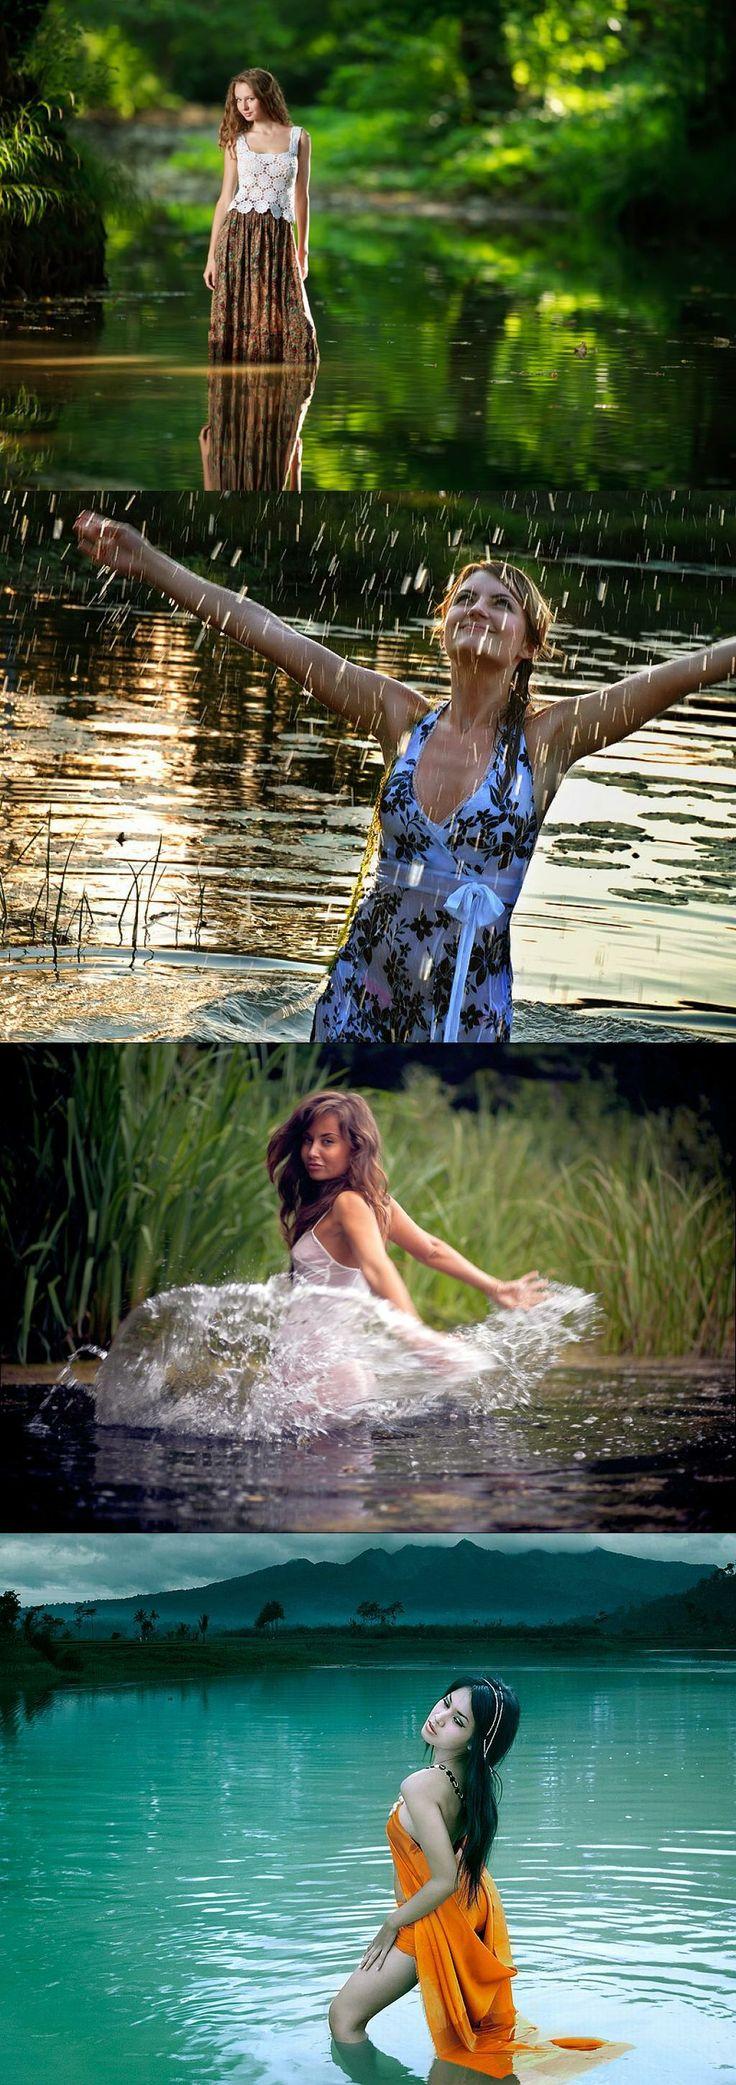 Girl-in-Water